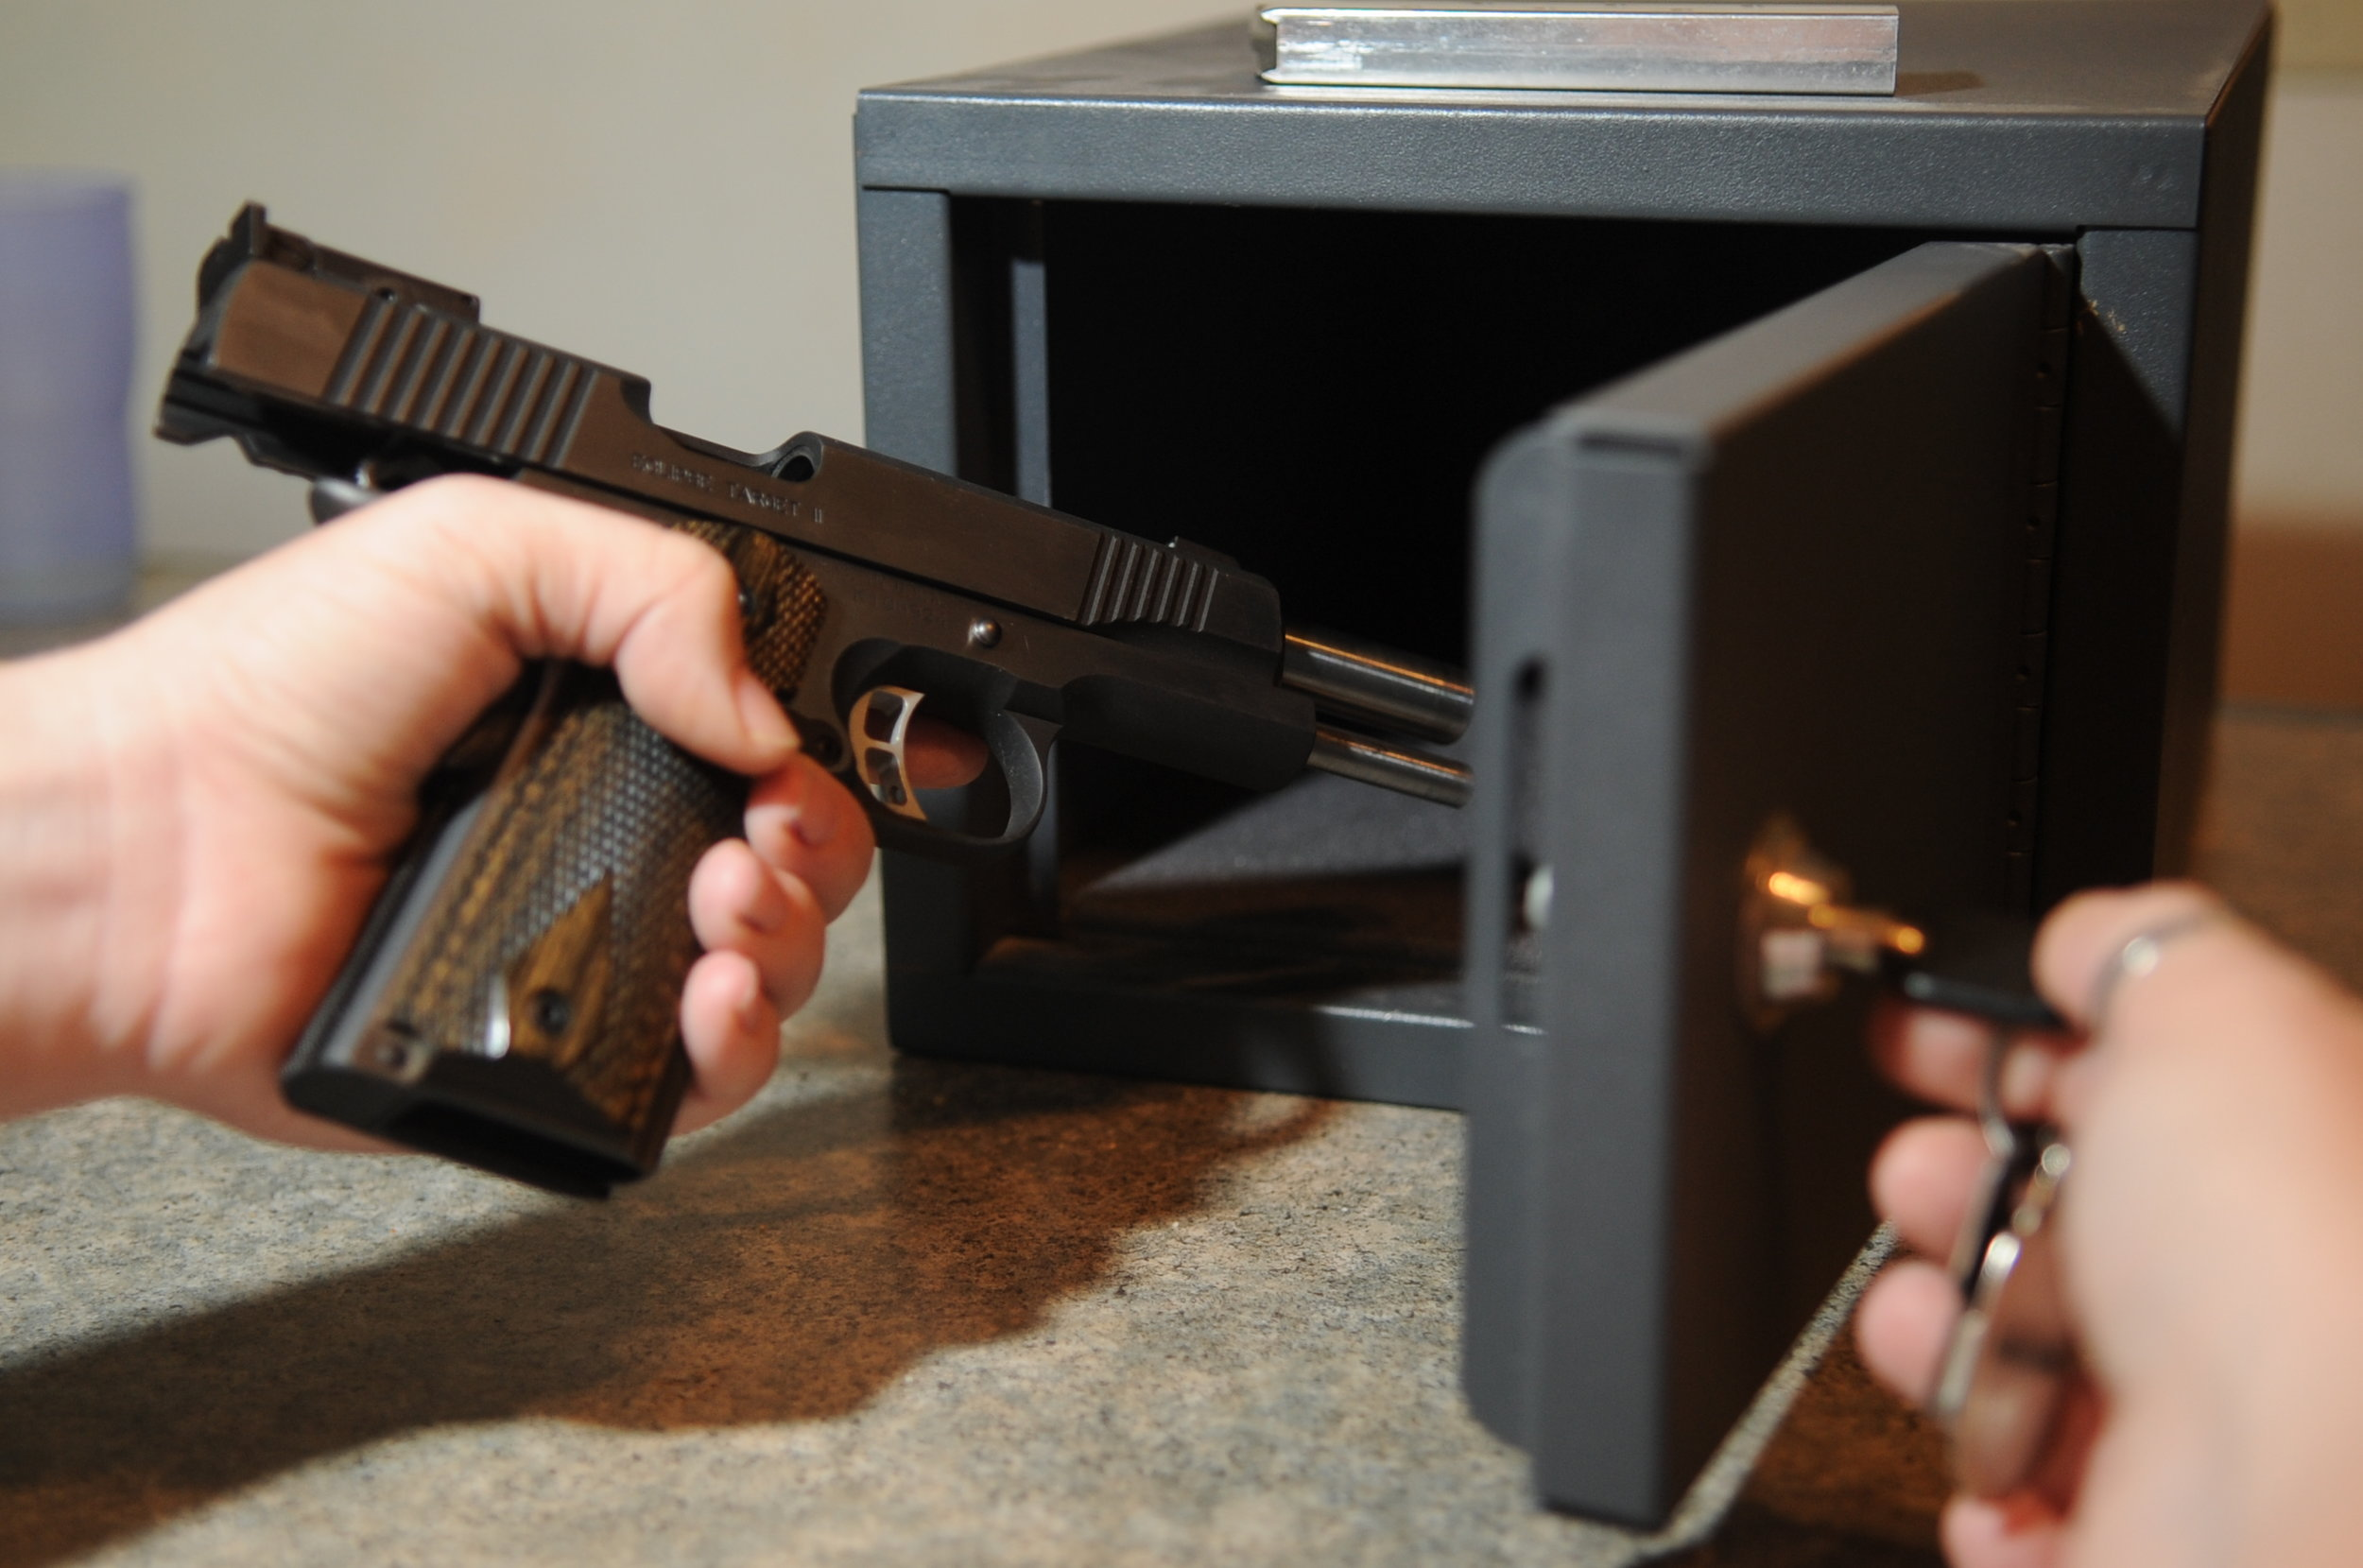 pistol safe pulitzer prize award winning photo GRAPH.JPG